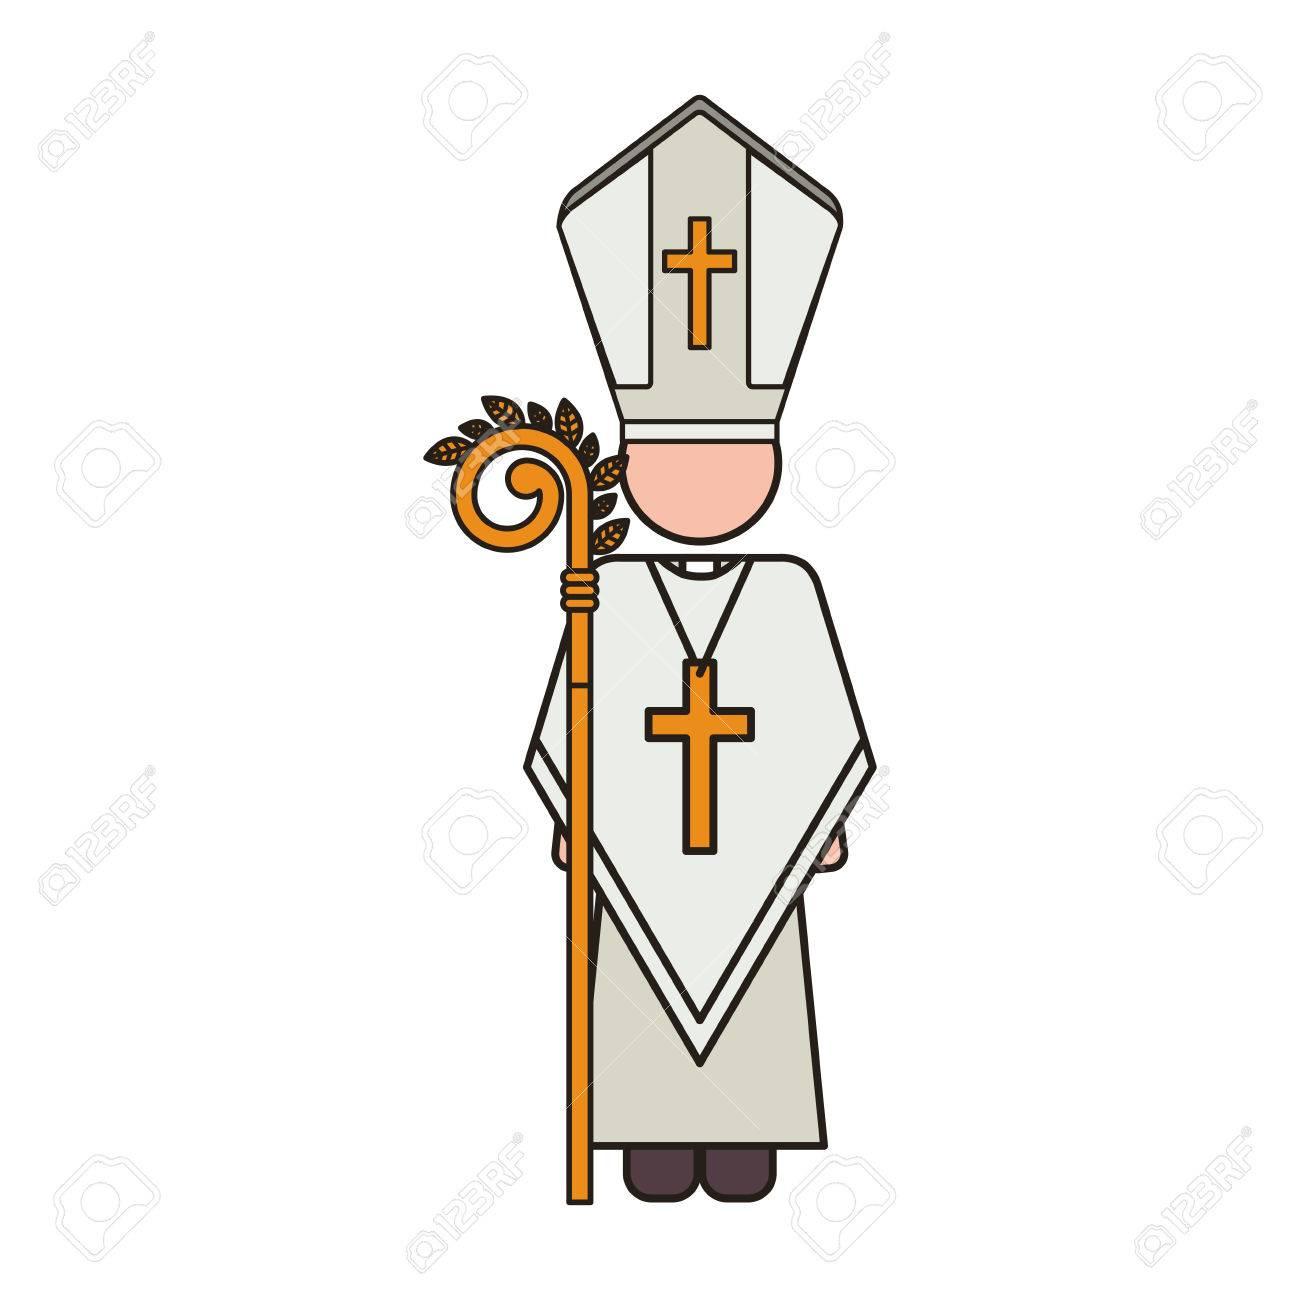 Priest clipart free png transparent Priest Clipart Free | Free download best Priest Clipart Free ... png transparent